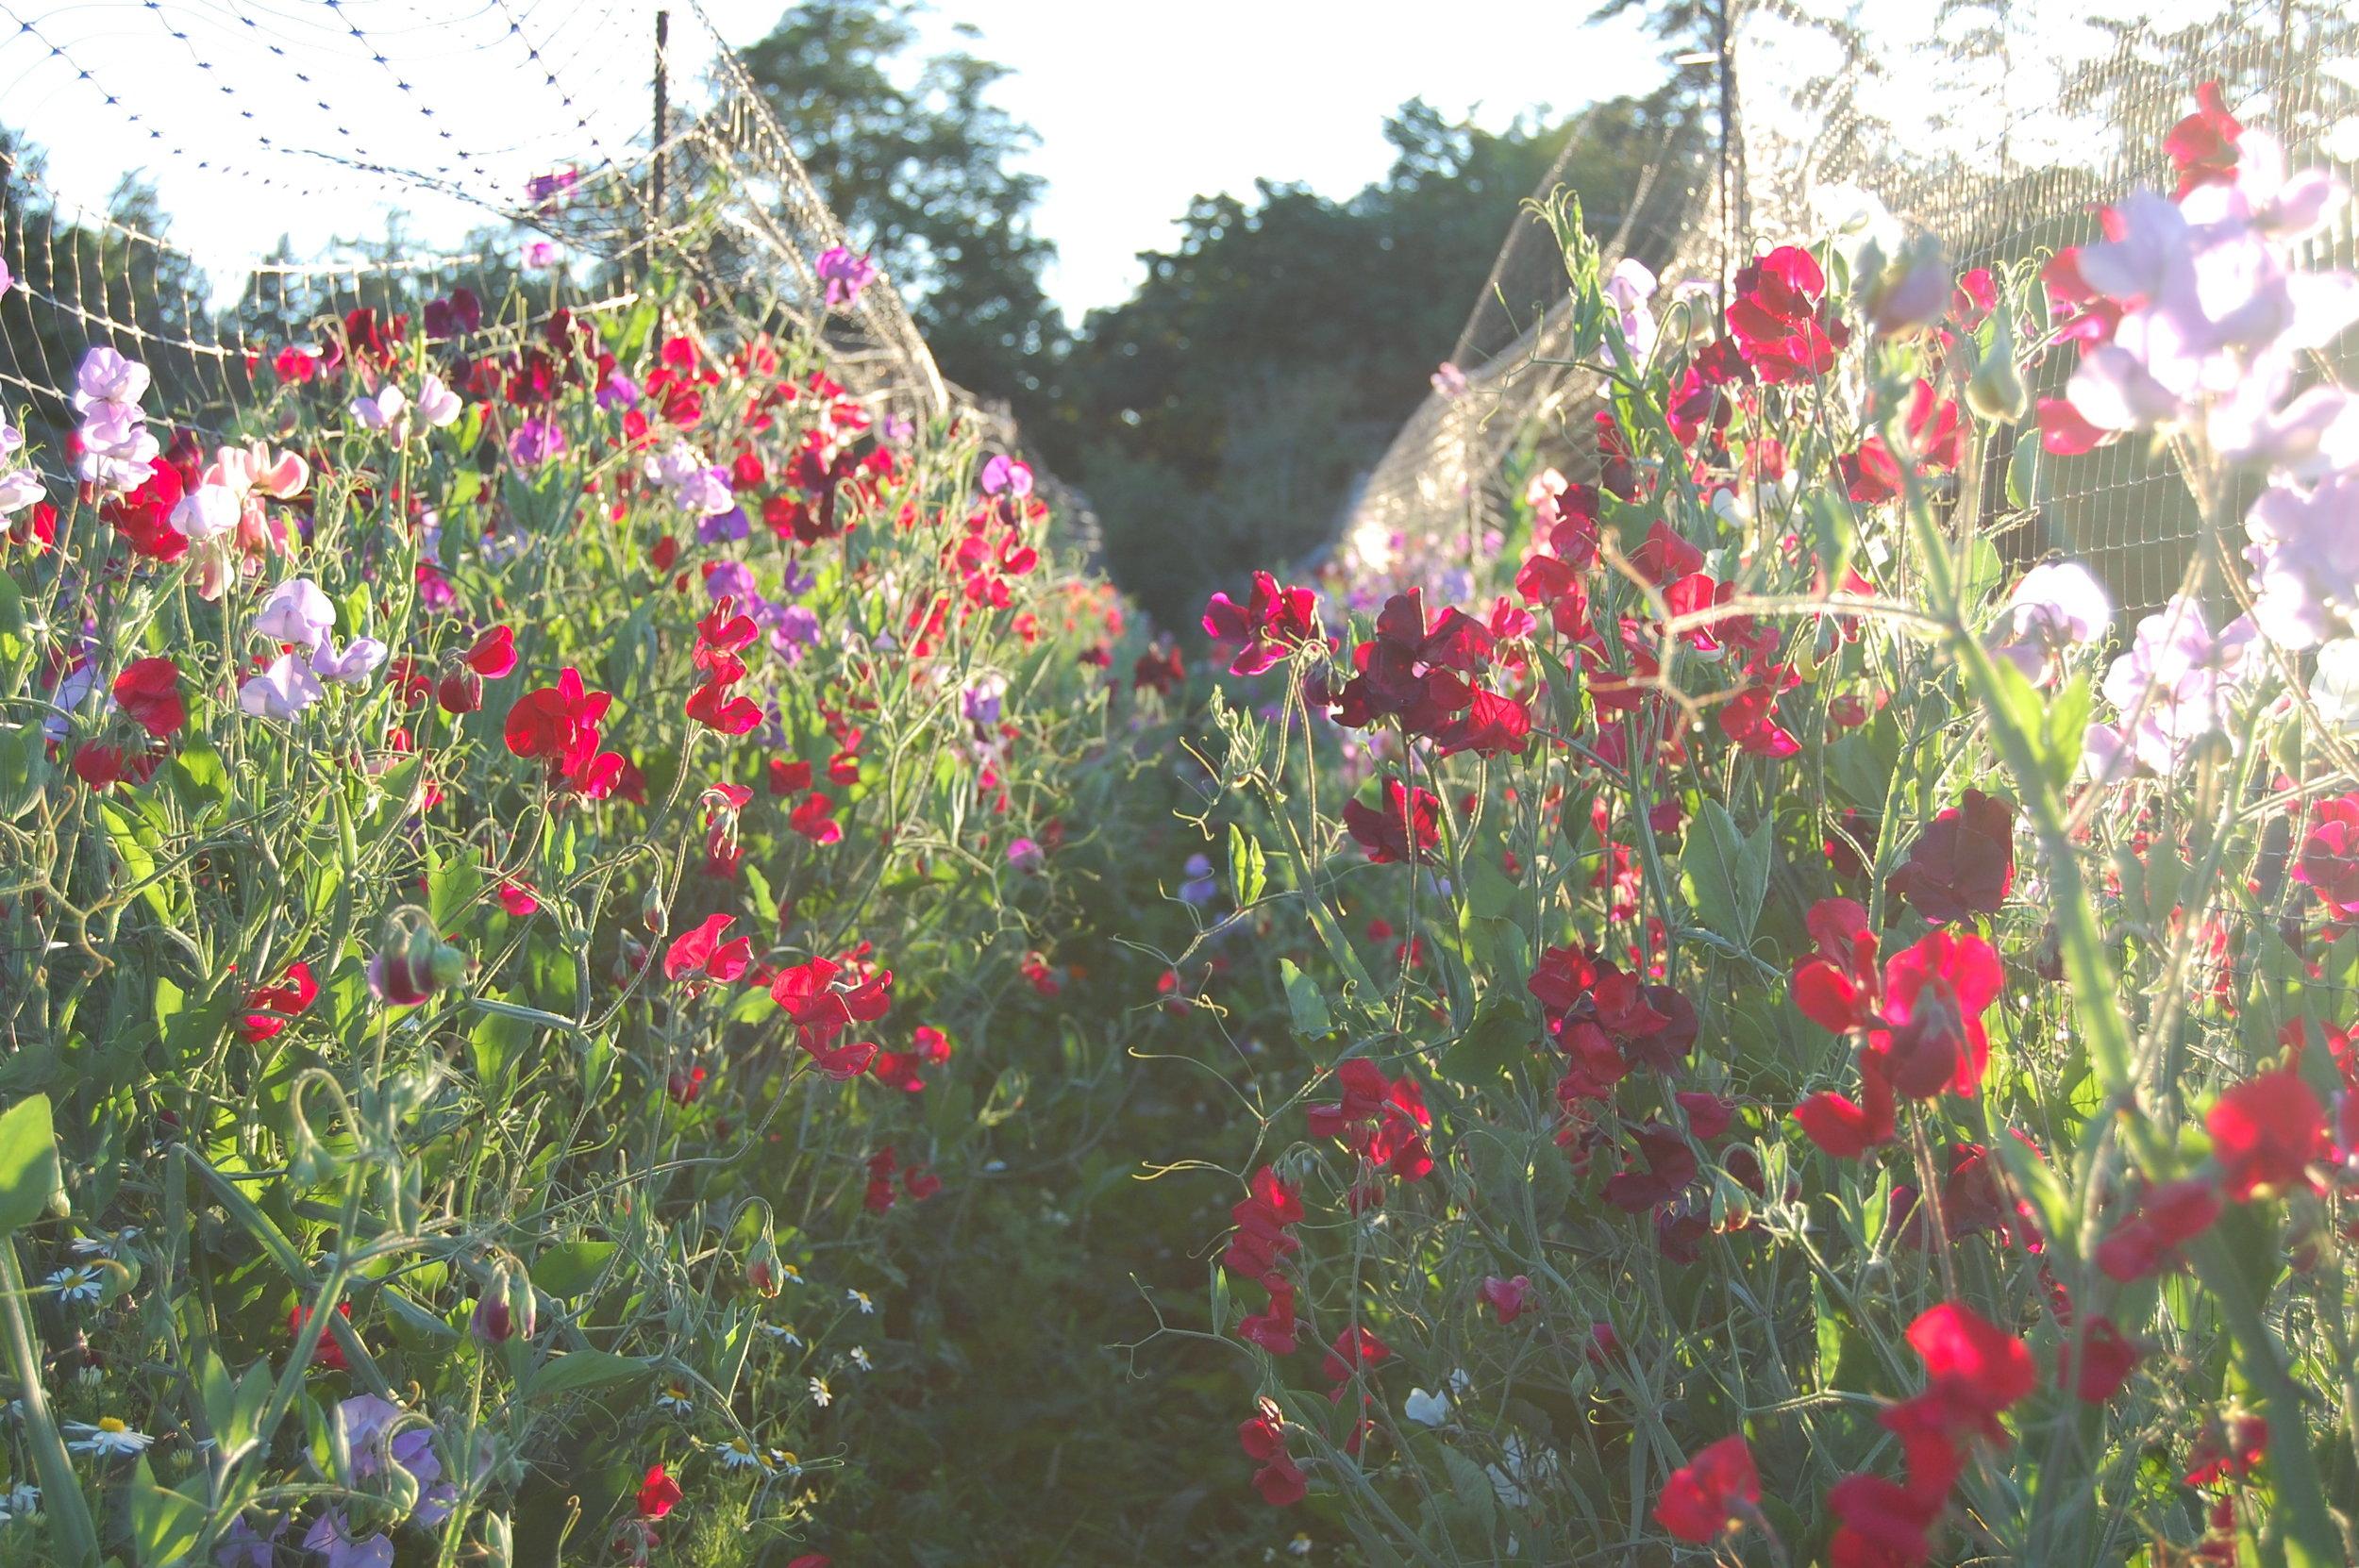 Flowers_Farm.jpg